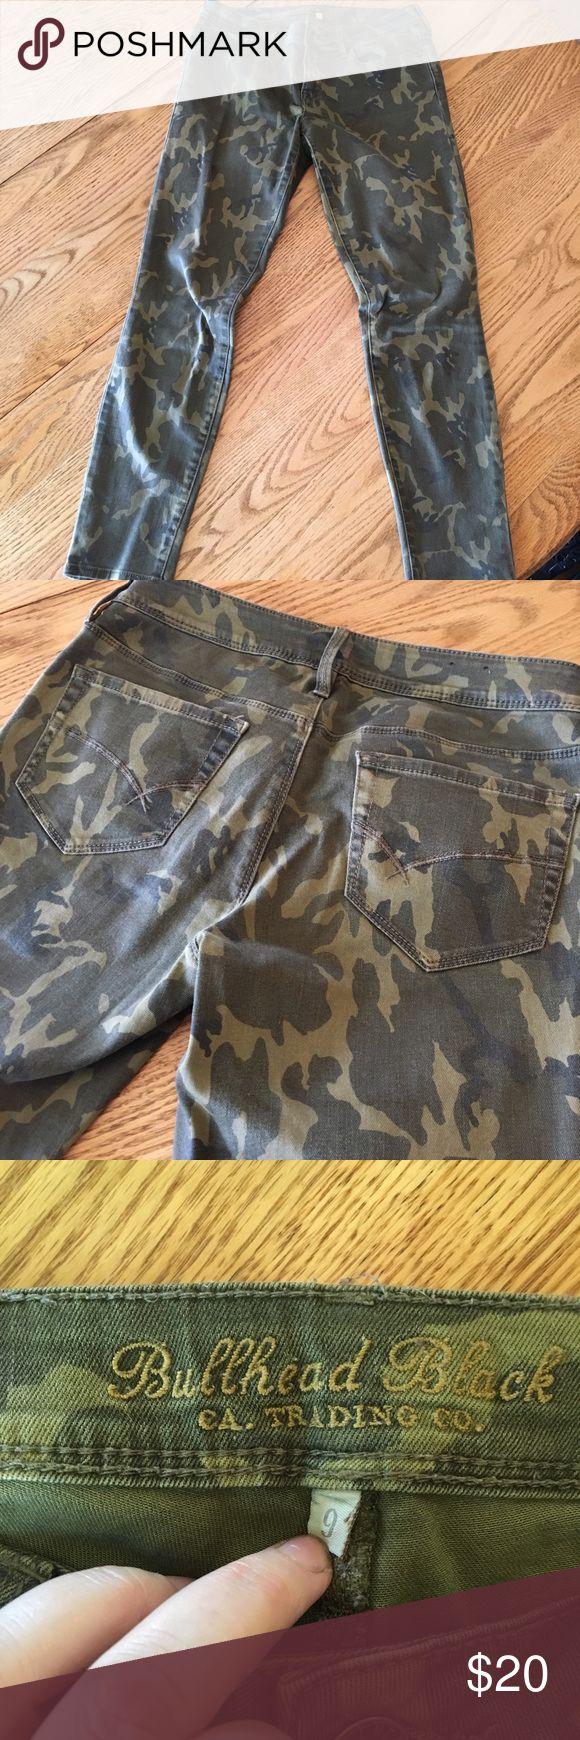 Bullhead Black camo skinny jeans Bullhead Black camo skinny jeans.  Size 9 PacSun Pants Skinny